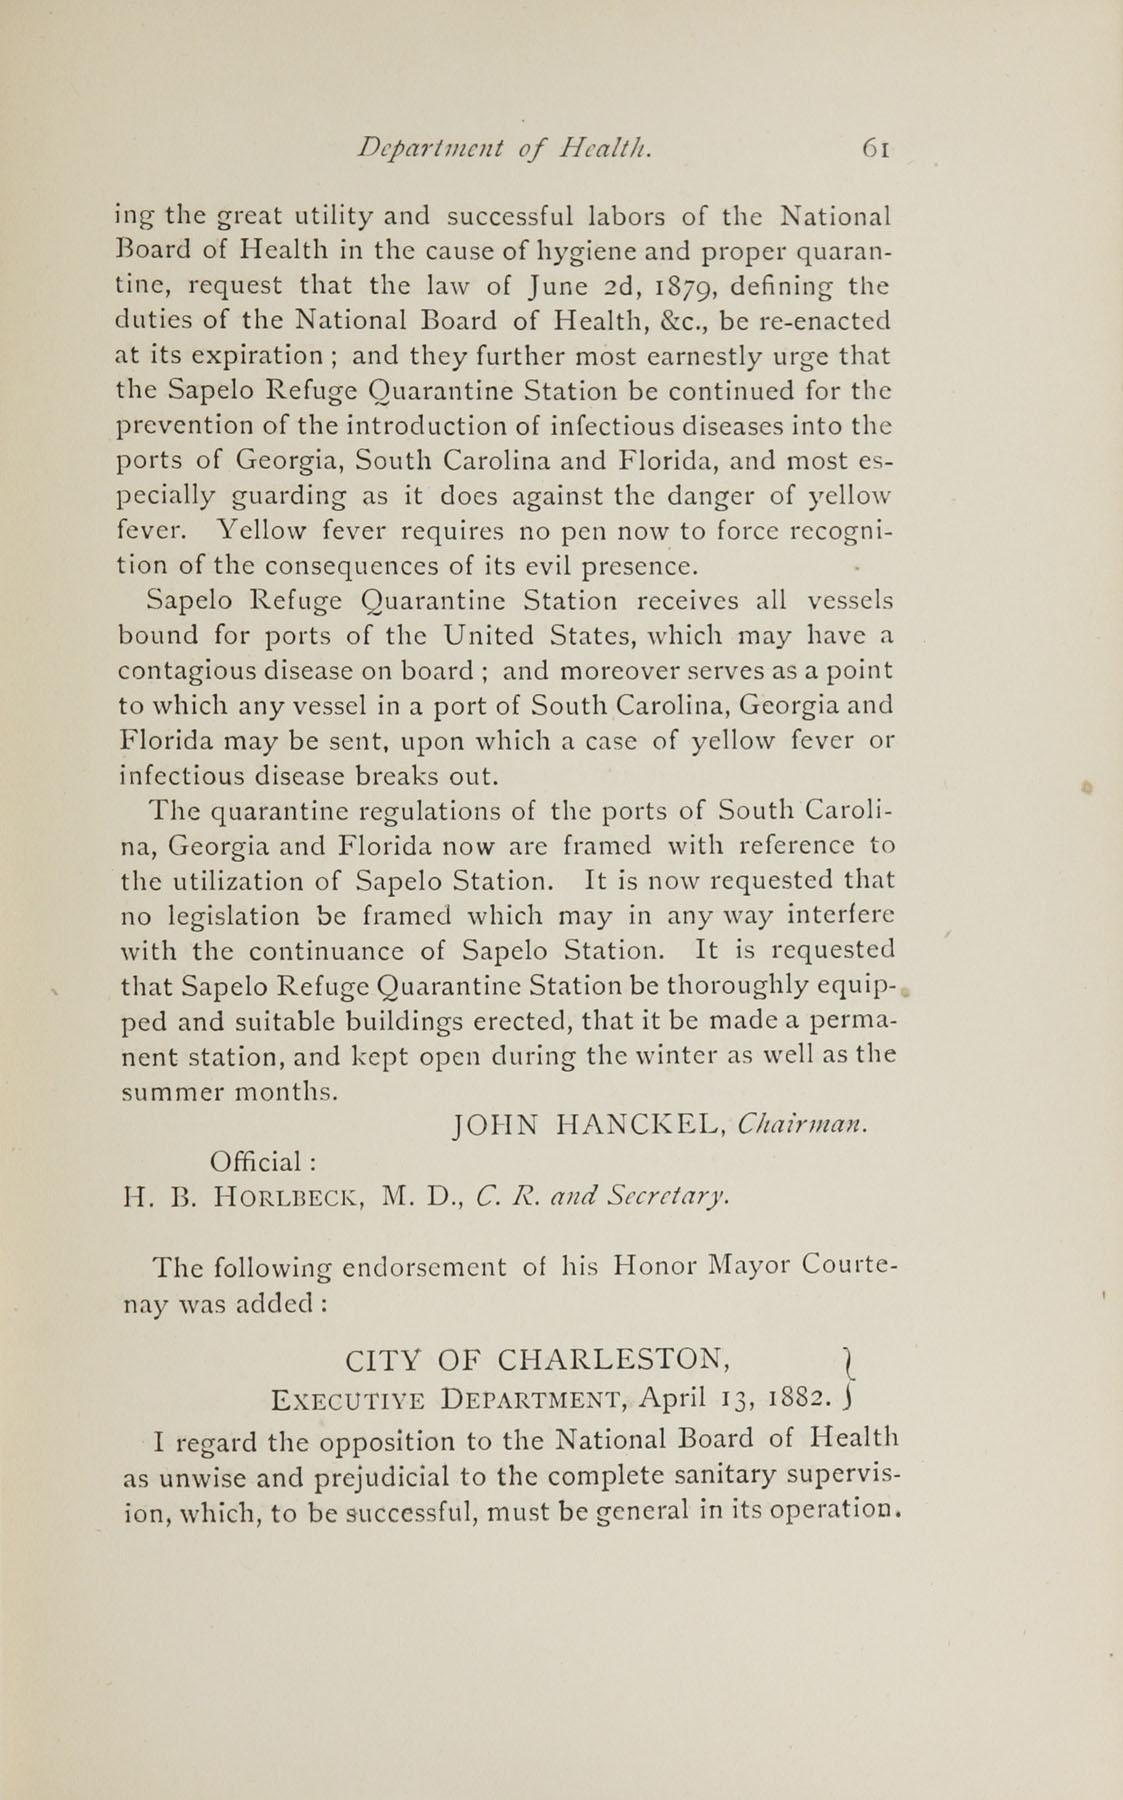 Charleston Yearbook, 1882, page 61